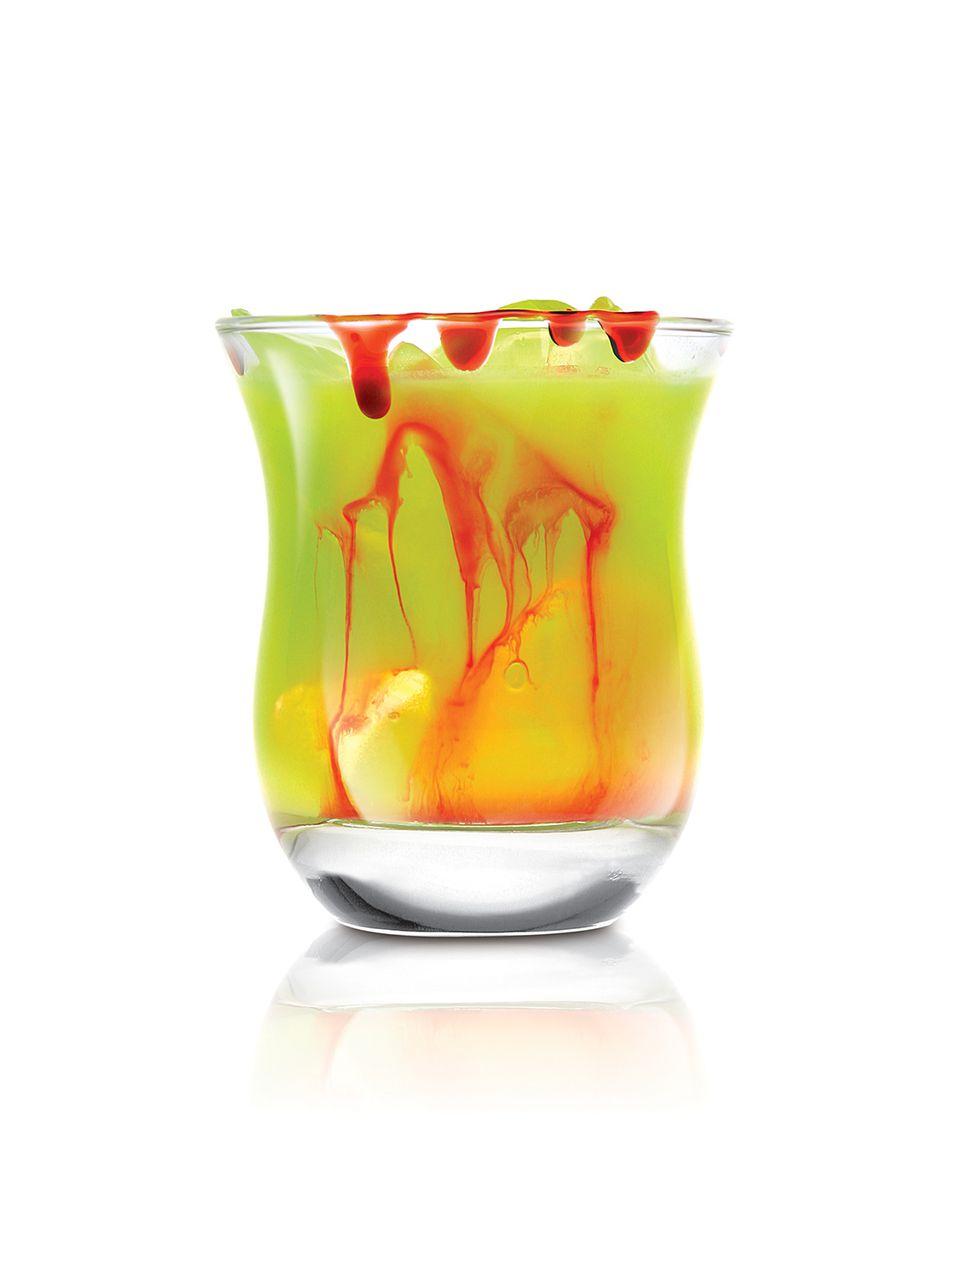 SKYY Vodka's Vampire's Kiss Halloween Cocktail